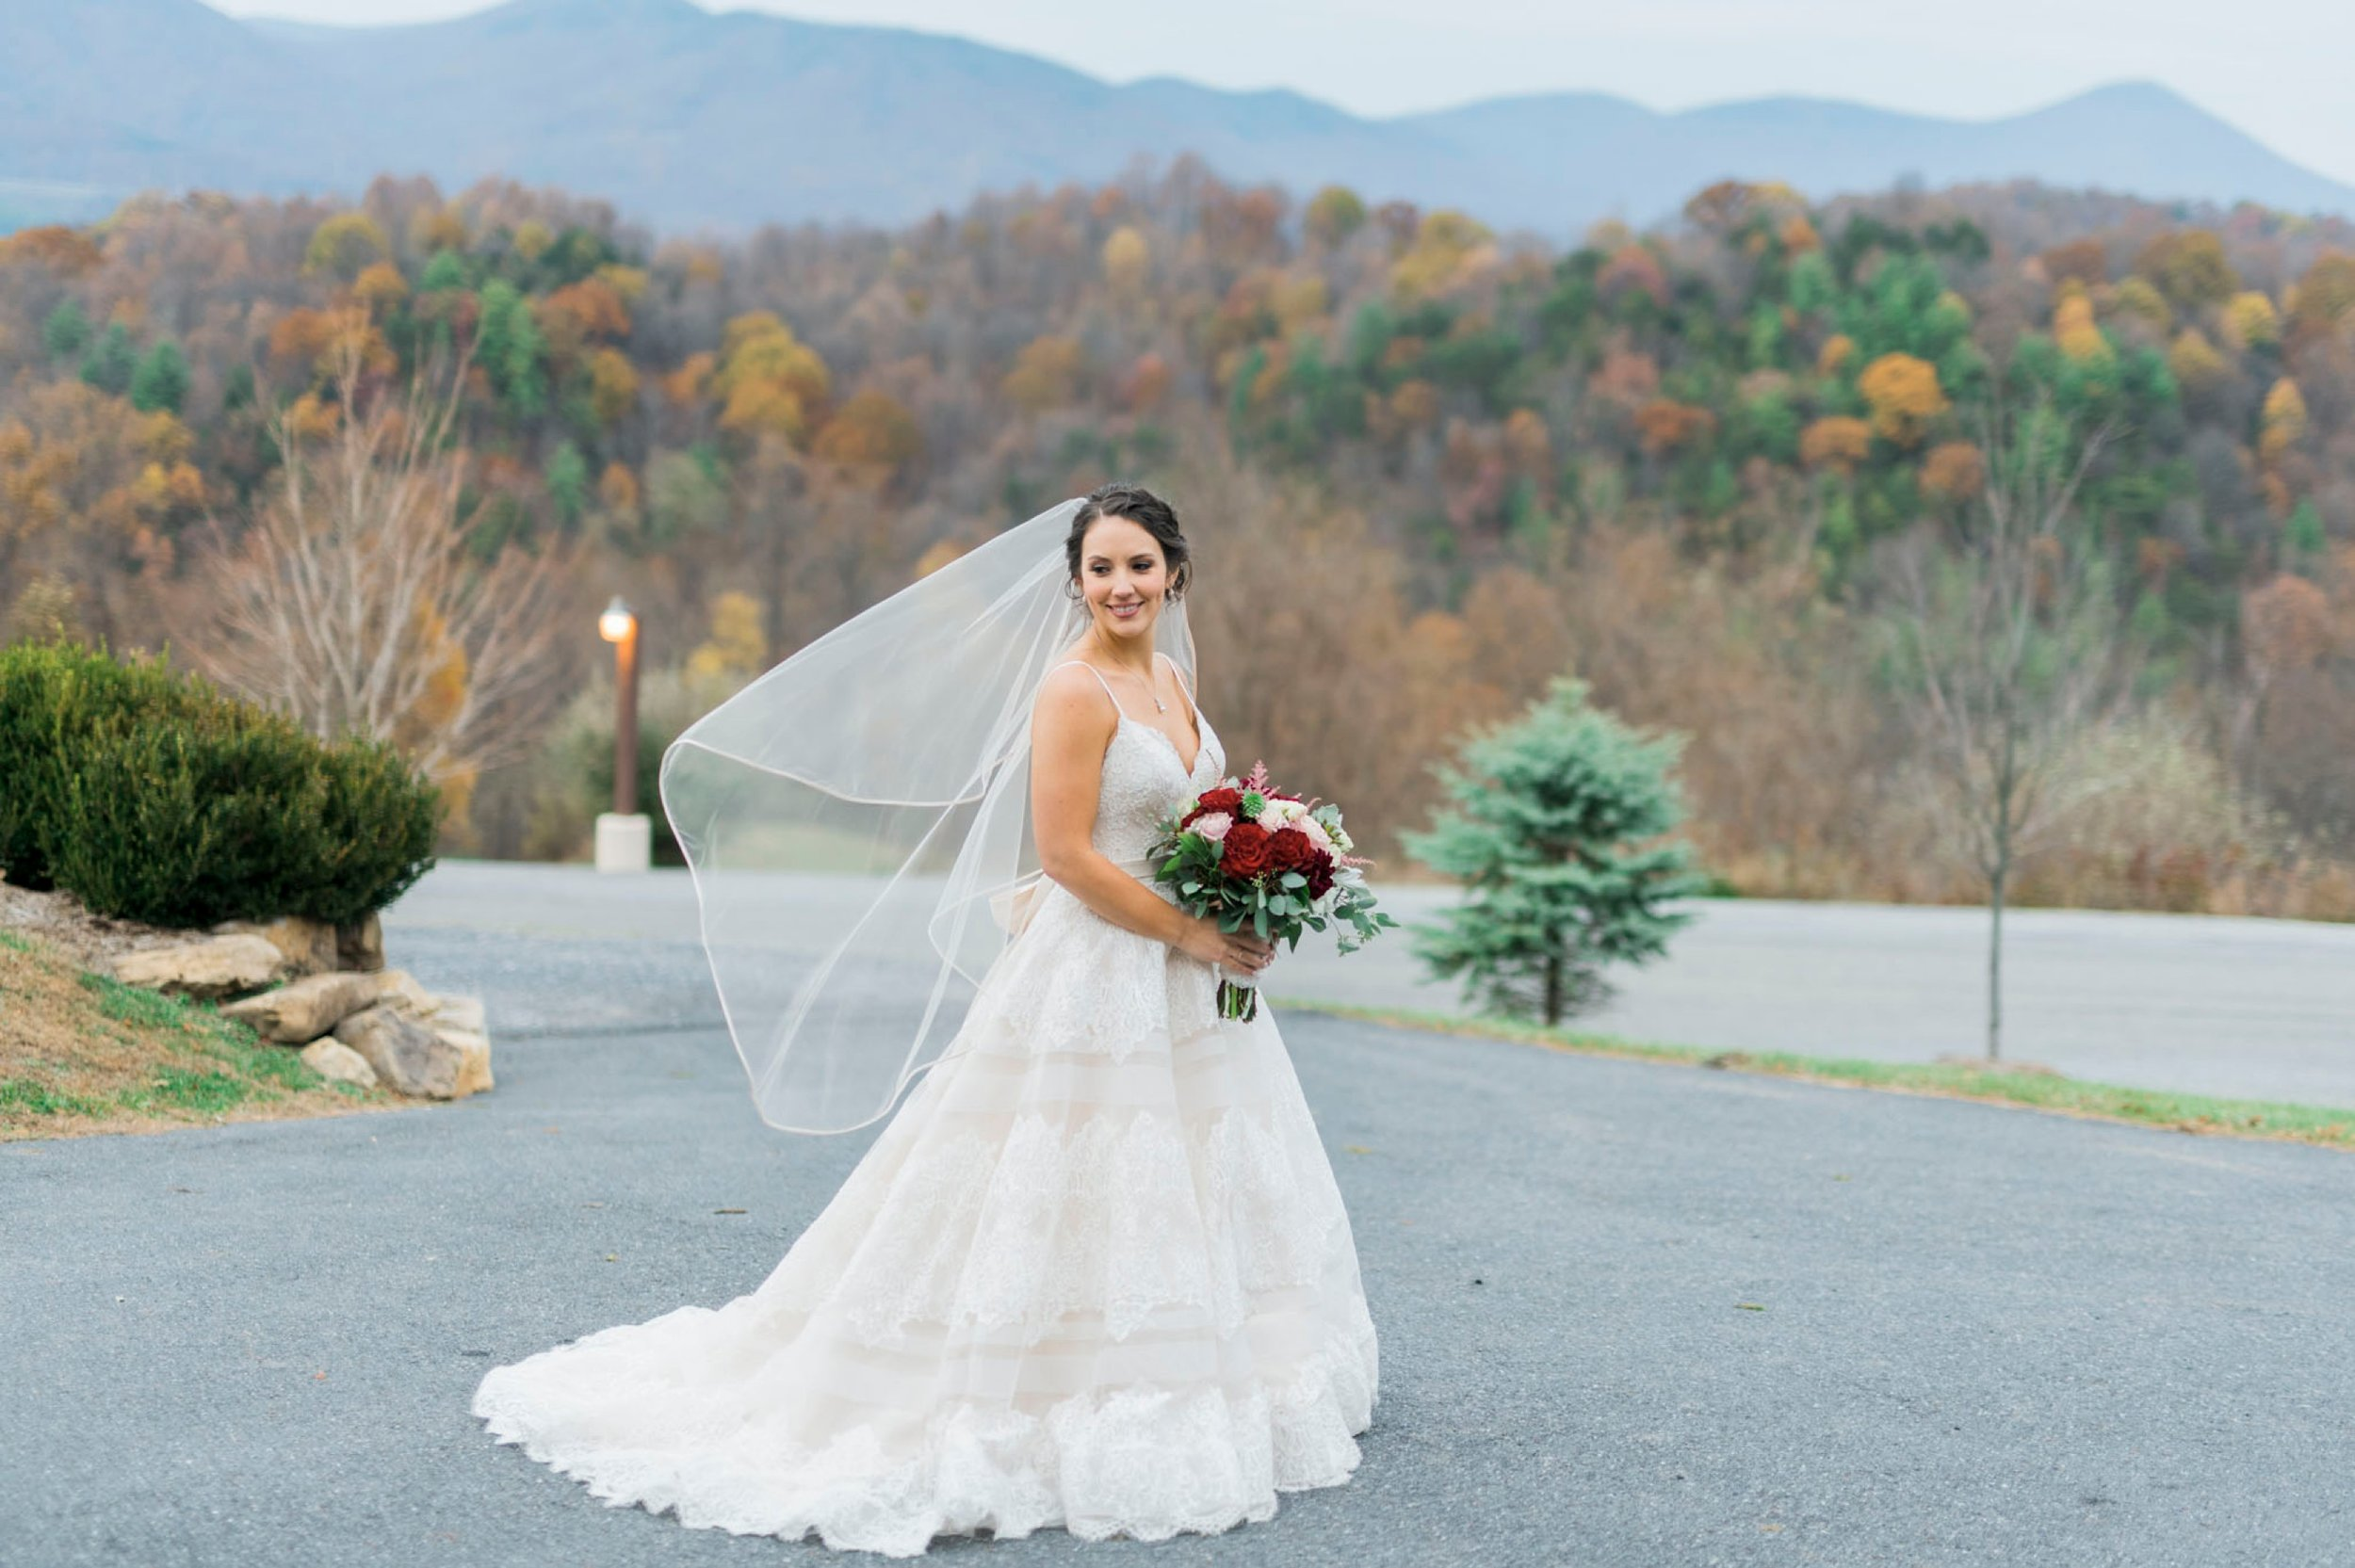 IrvineEstate_LexingtonVA_Wedding_FallWedding_VirginiaWeddingPhotographer 101.jpg